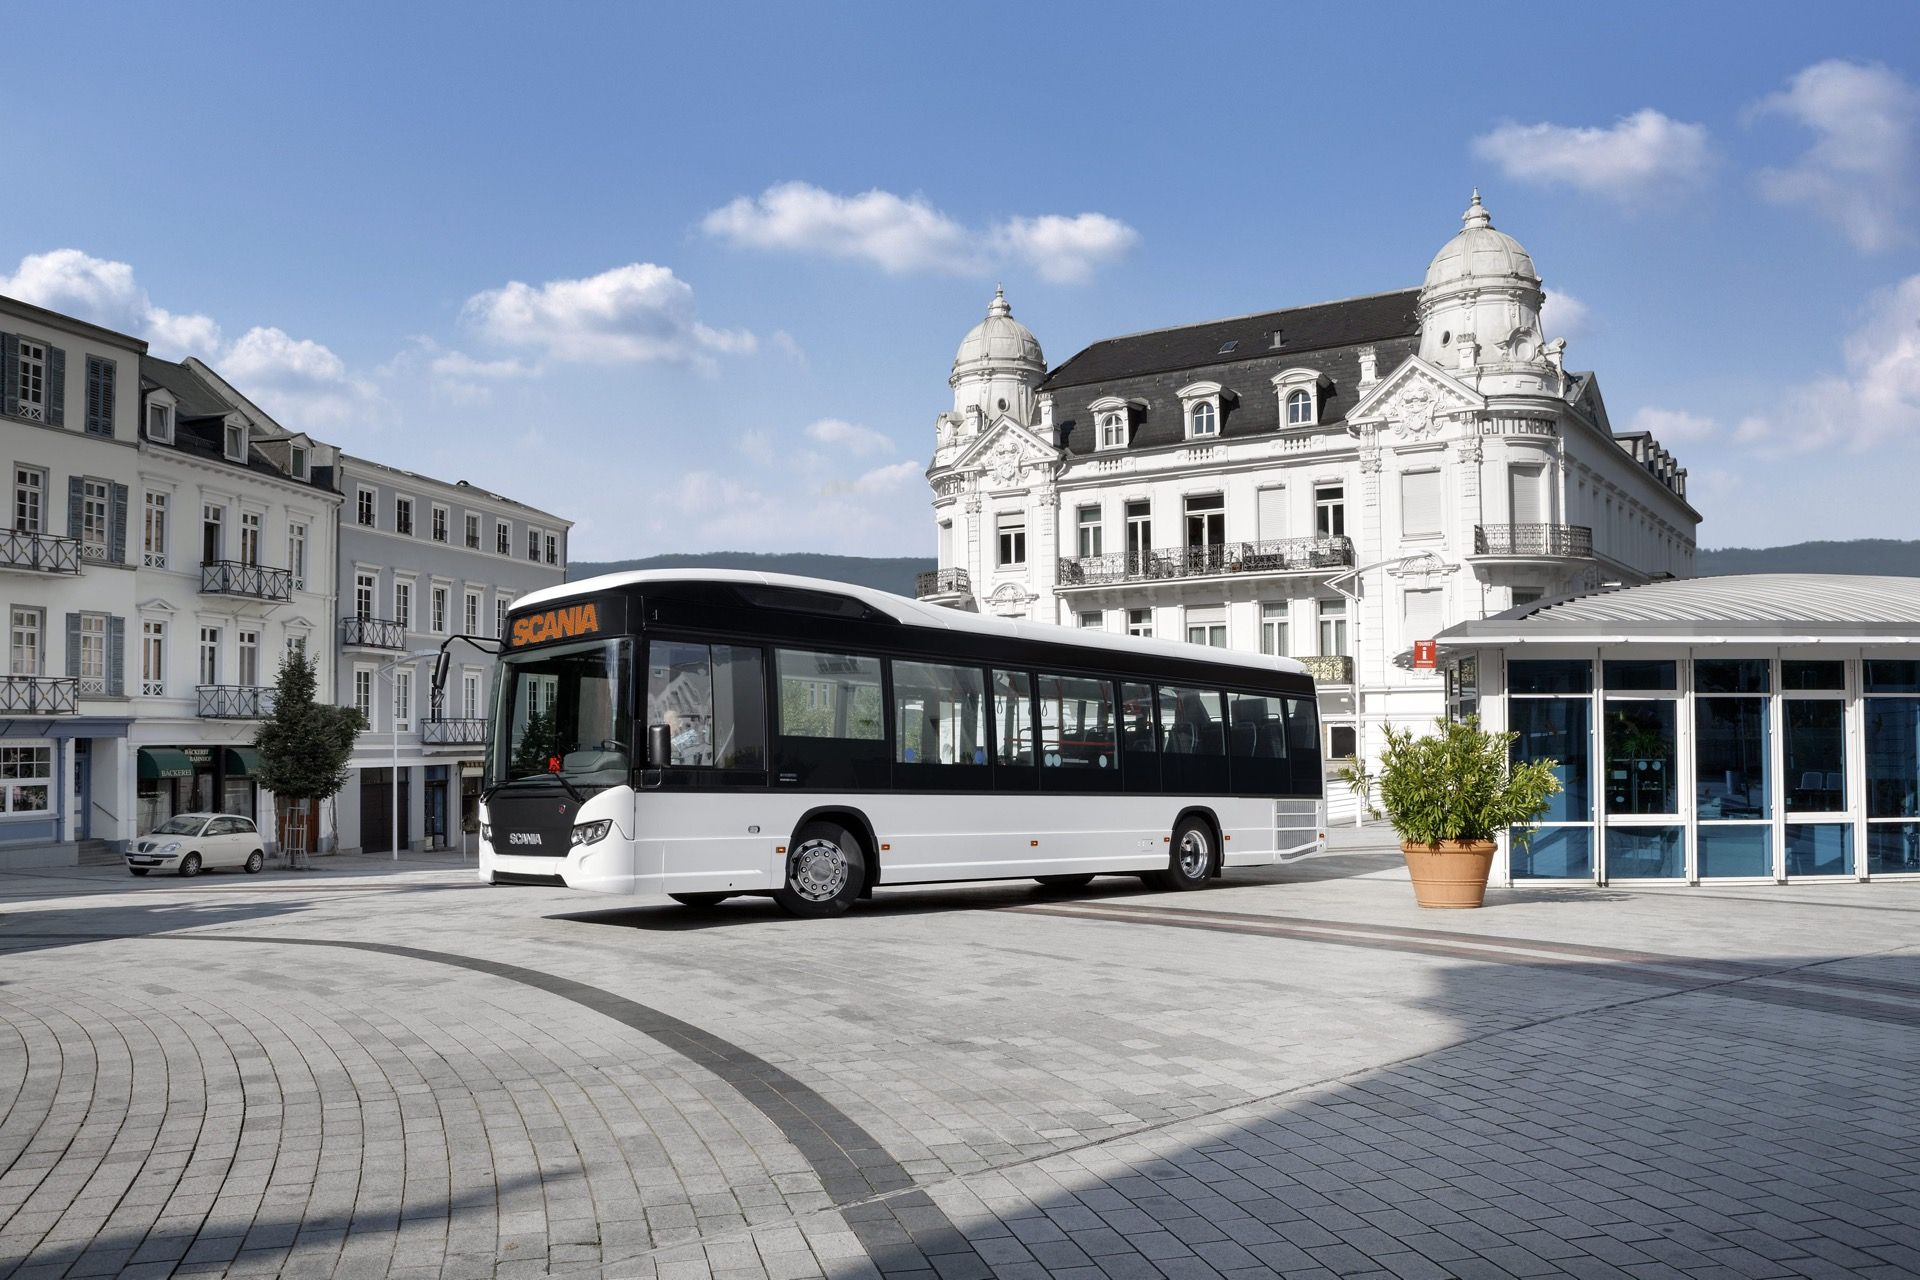 Scania Citywide Le Hybrid Bus Stop Bus Photo